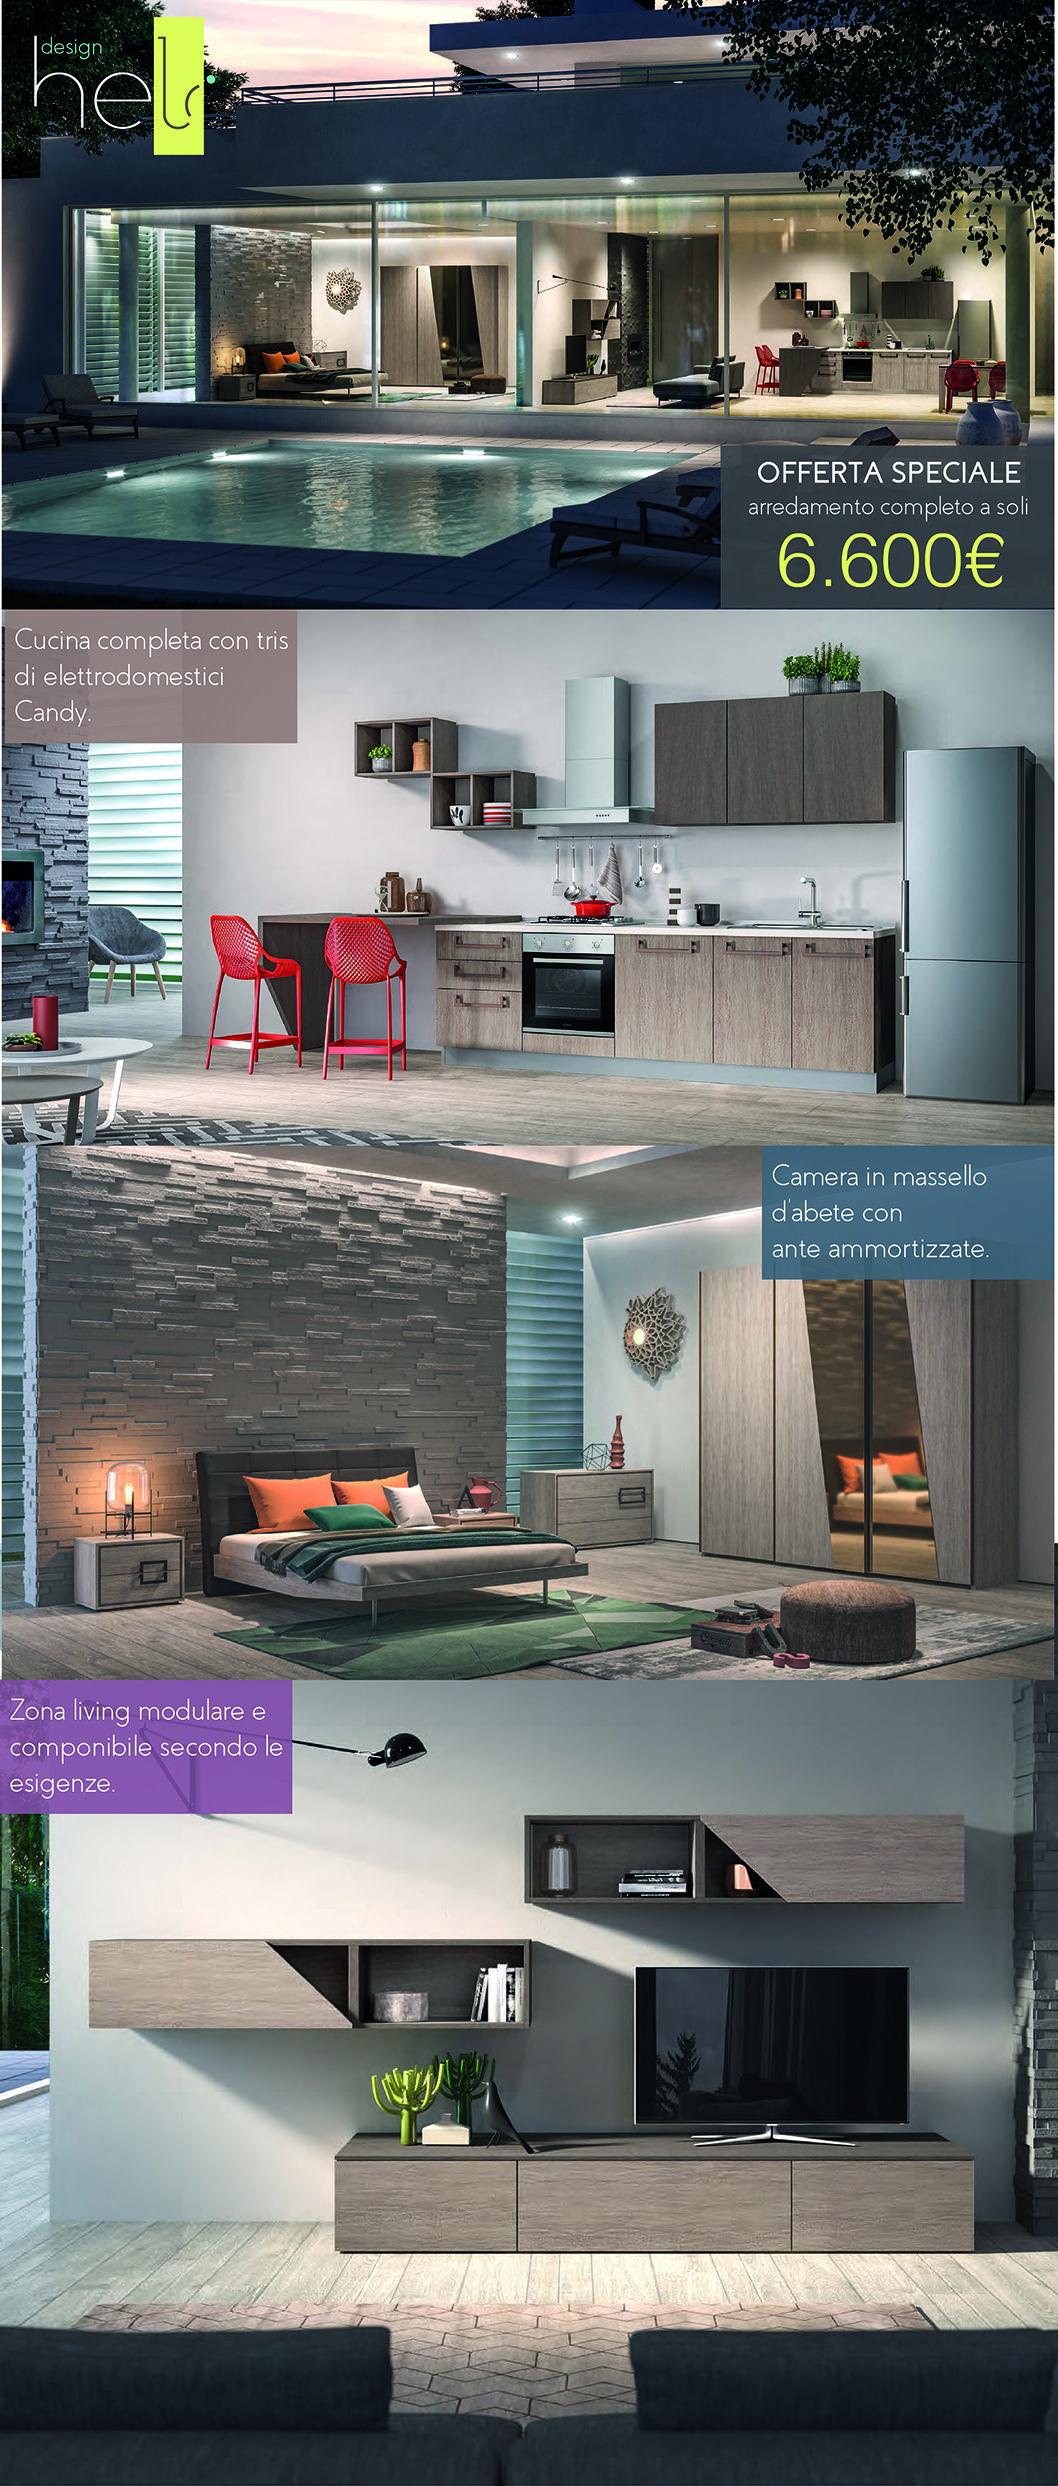 Offerta speciale Arredo cucina, camera matrimoniale e zona living a ...